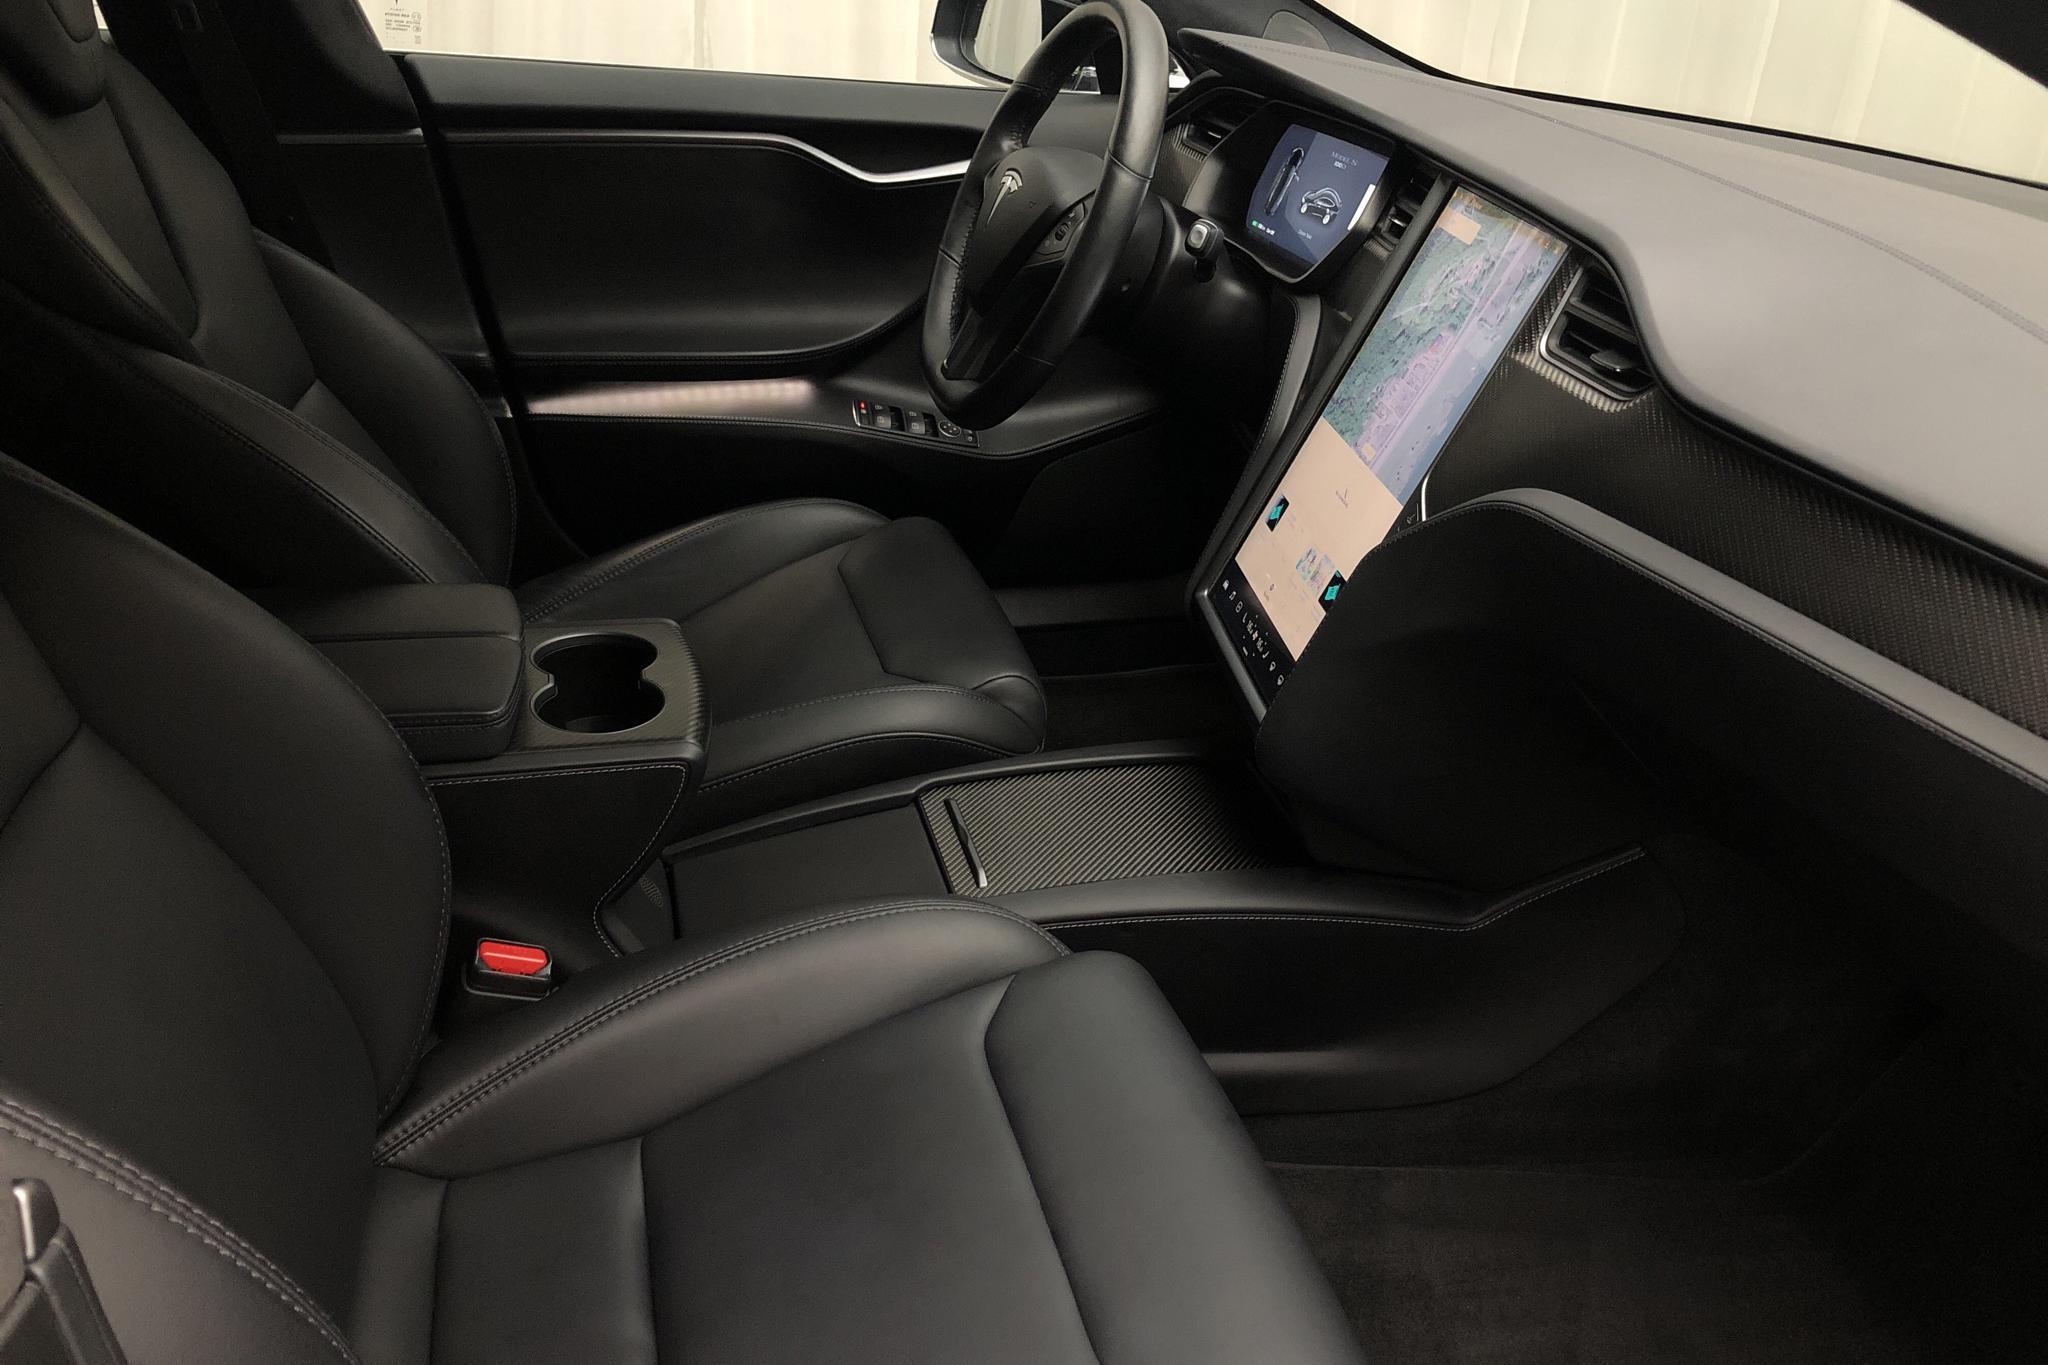 Tesla Model S 100D - 3 538 mil - Automat - svart - 2019